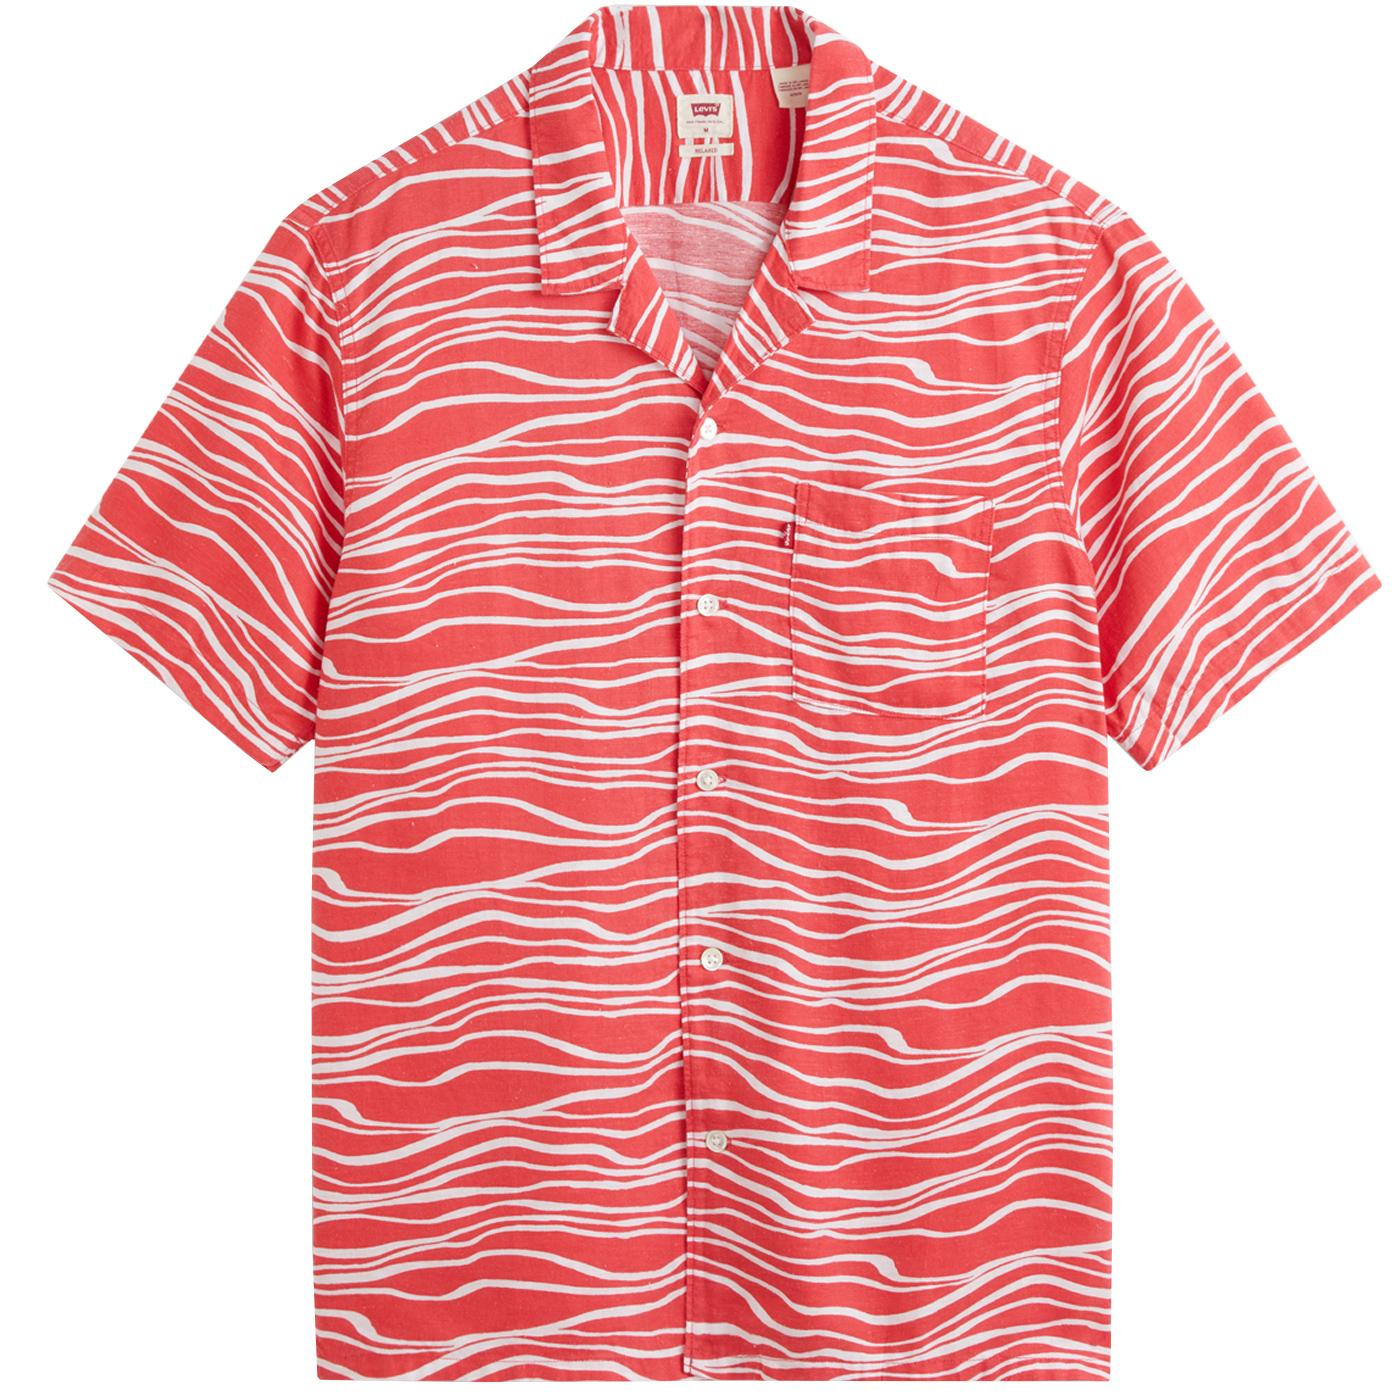 LEVI'S Wavy Stripe Revere Collar 70s Cubano Shirt